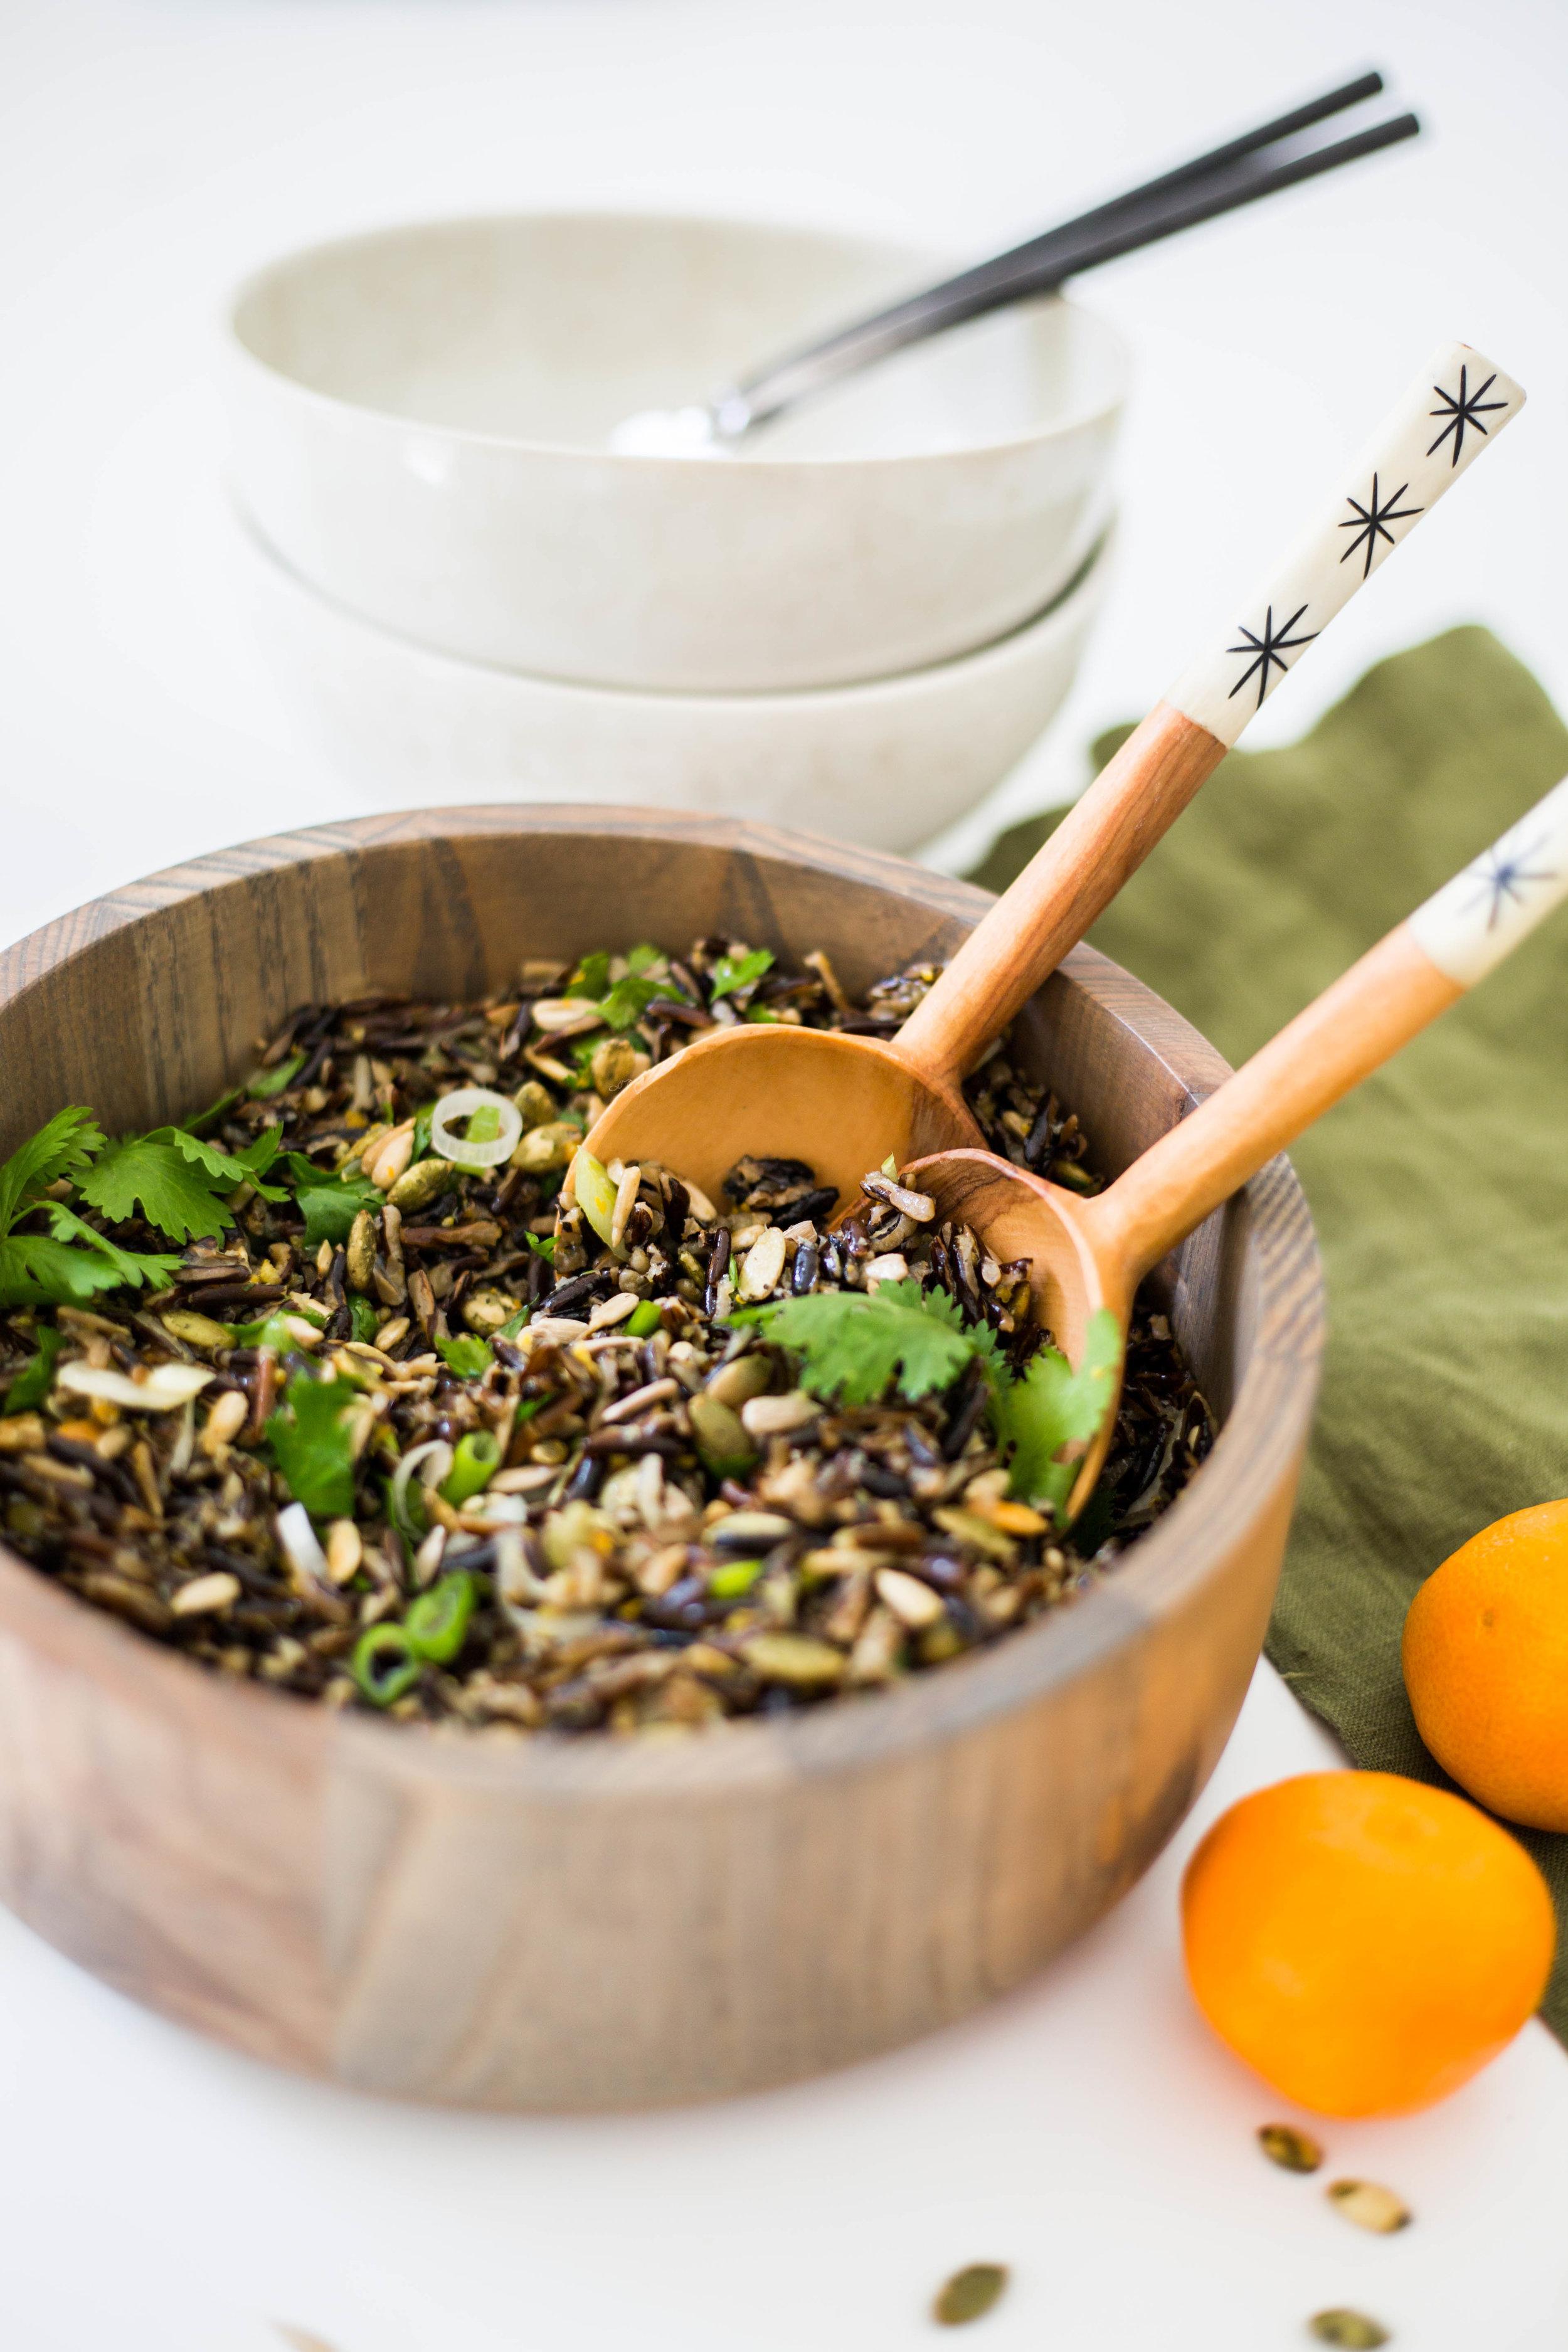 Superfood Protein-packed Wild Rice Salad #vuori #purekitchenblog #plant-based #vegan #dairyfree